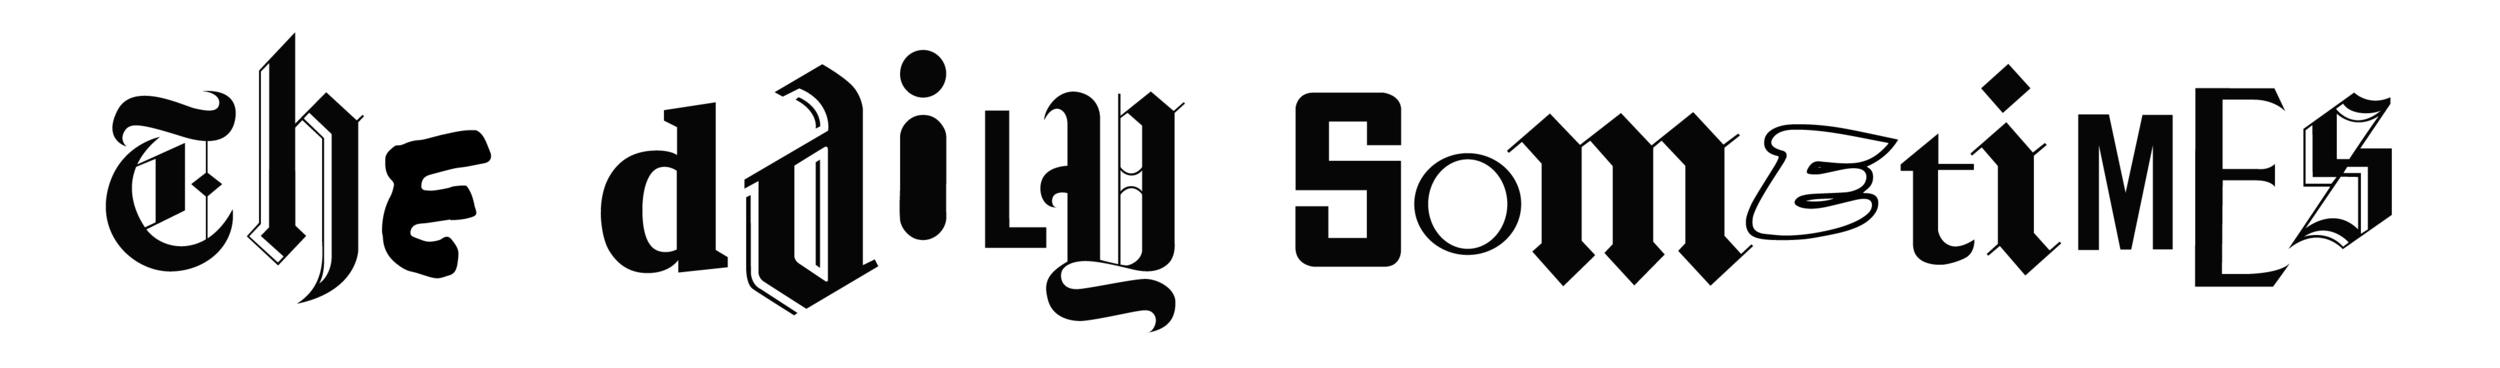 The_Daily_Sometimes_Logo_72.jpg